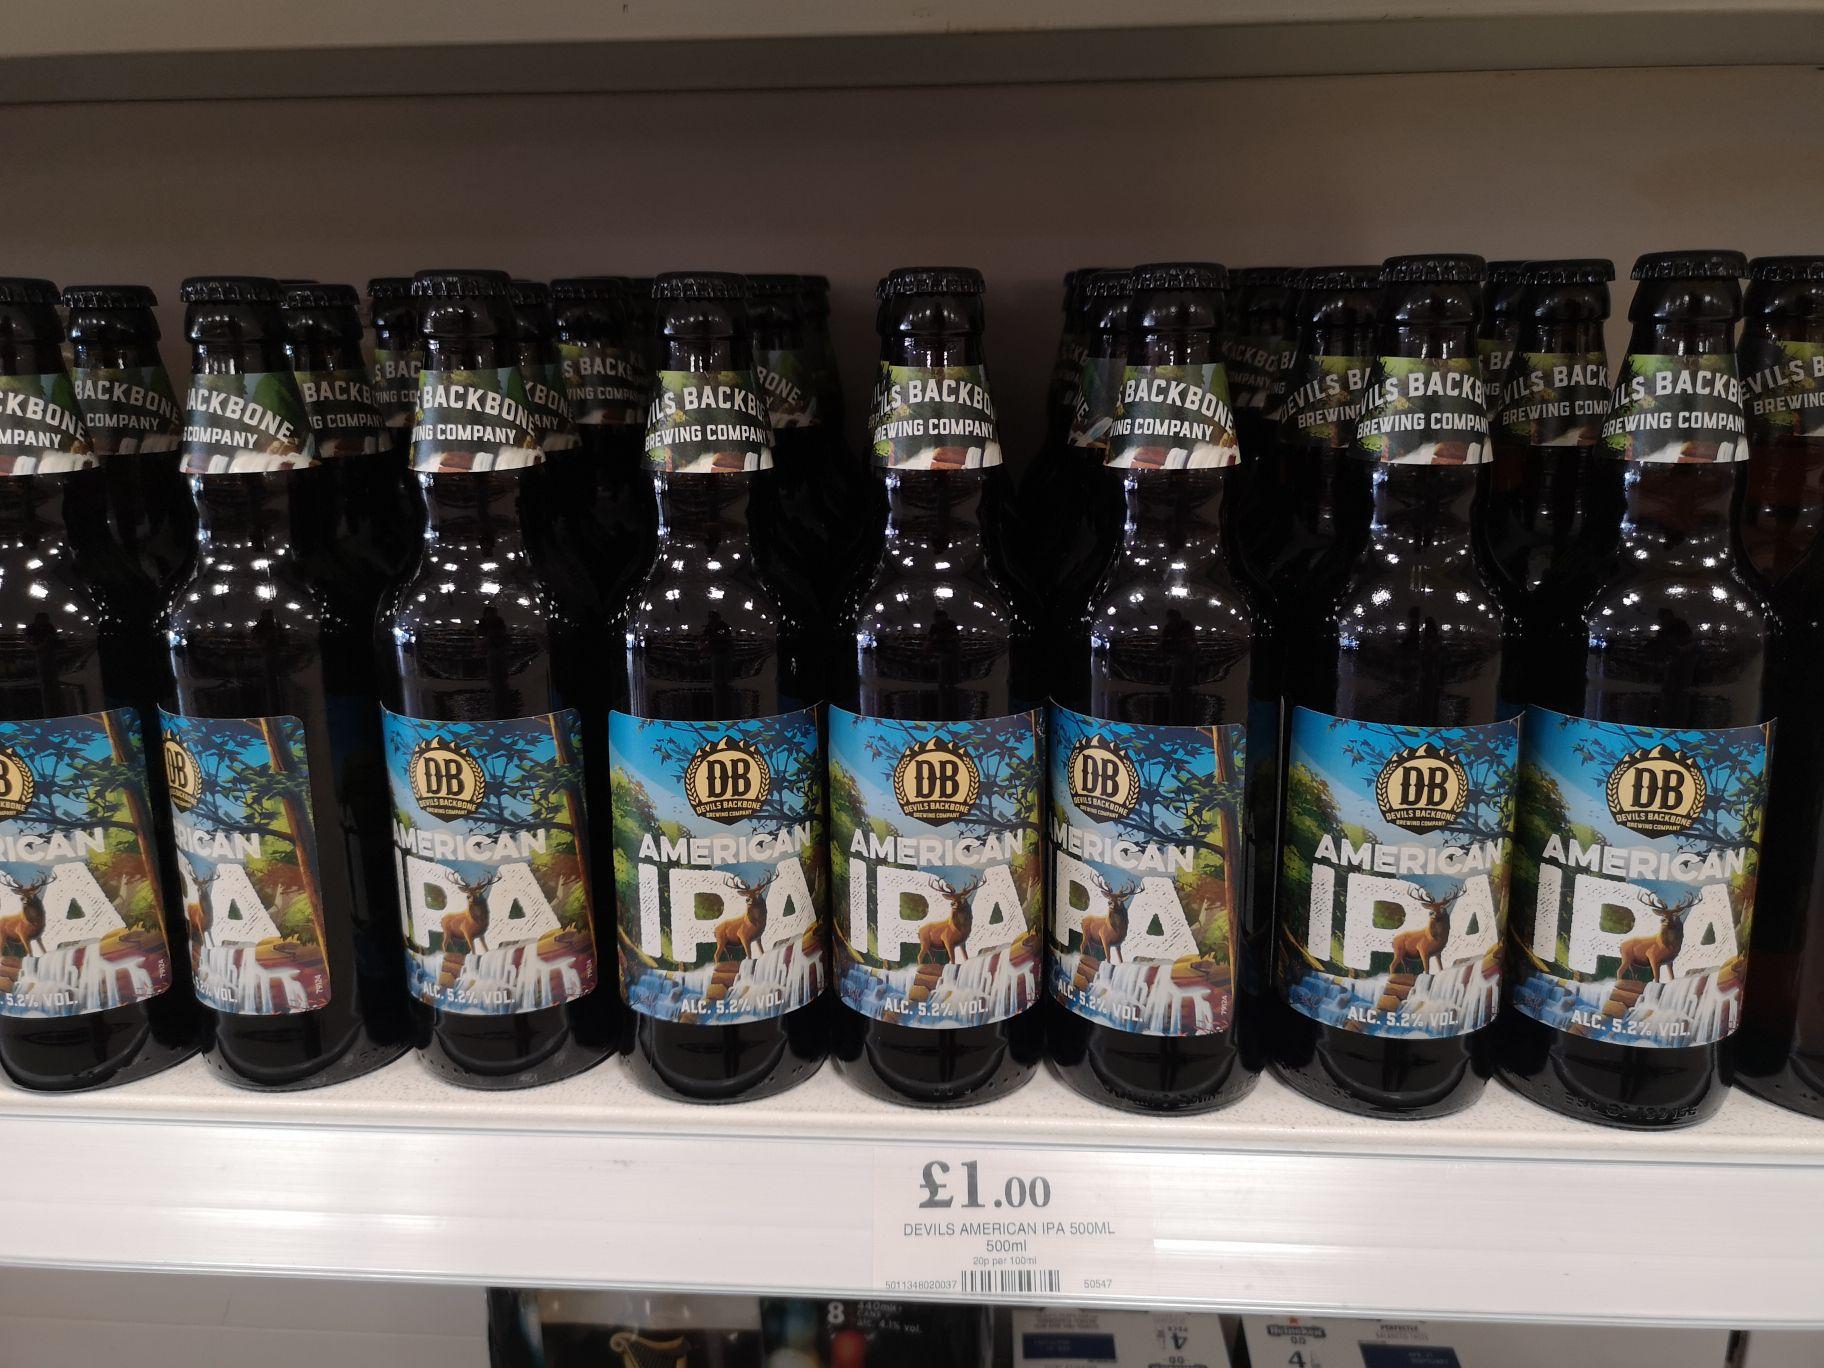 Devil's Backbone IPA £1 in Home Bargains Hoylake discount offer